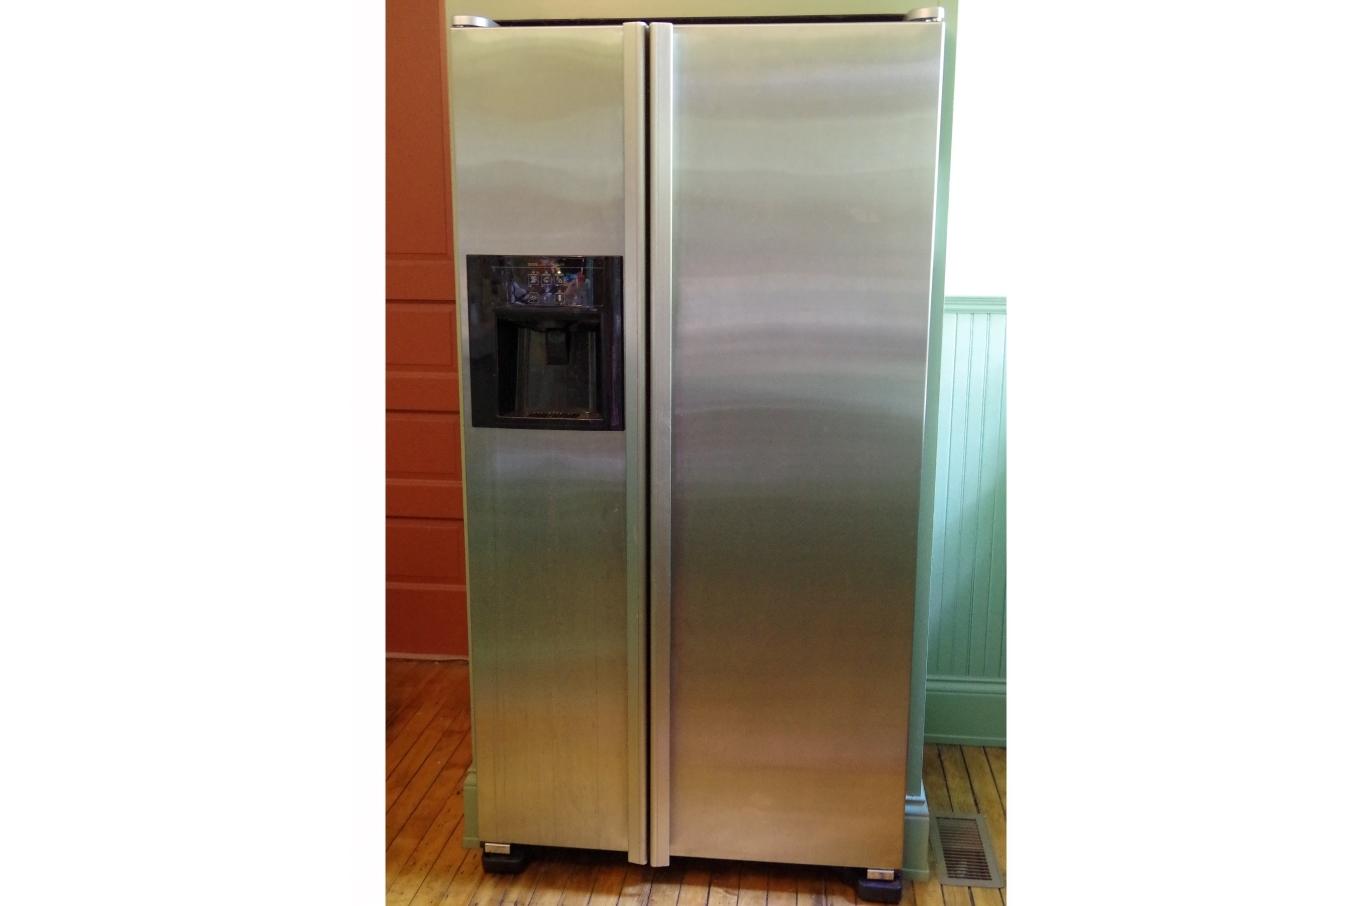 jenn air refrigerator side by side. jenn air refrigerator side by c